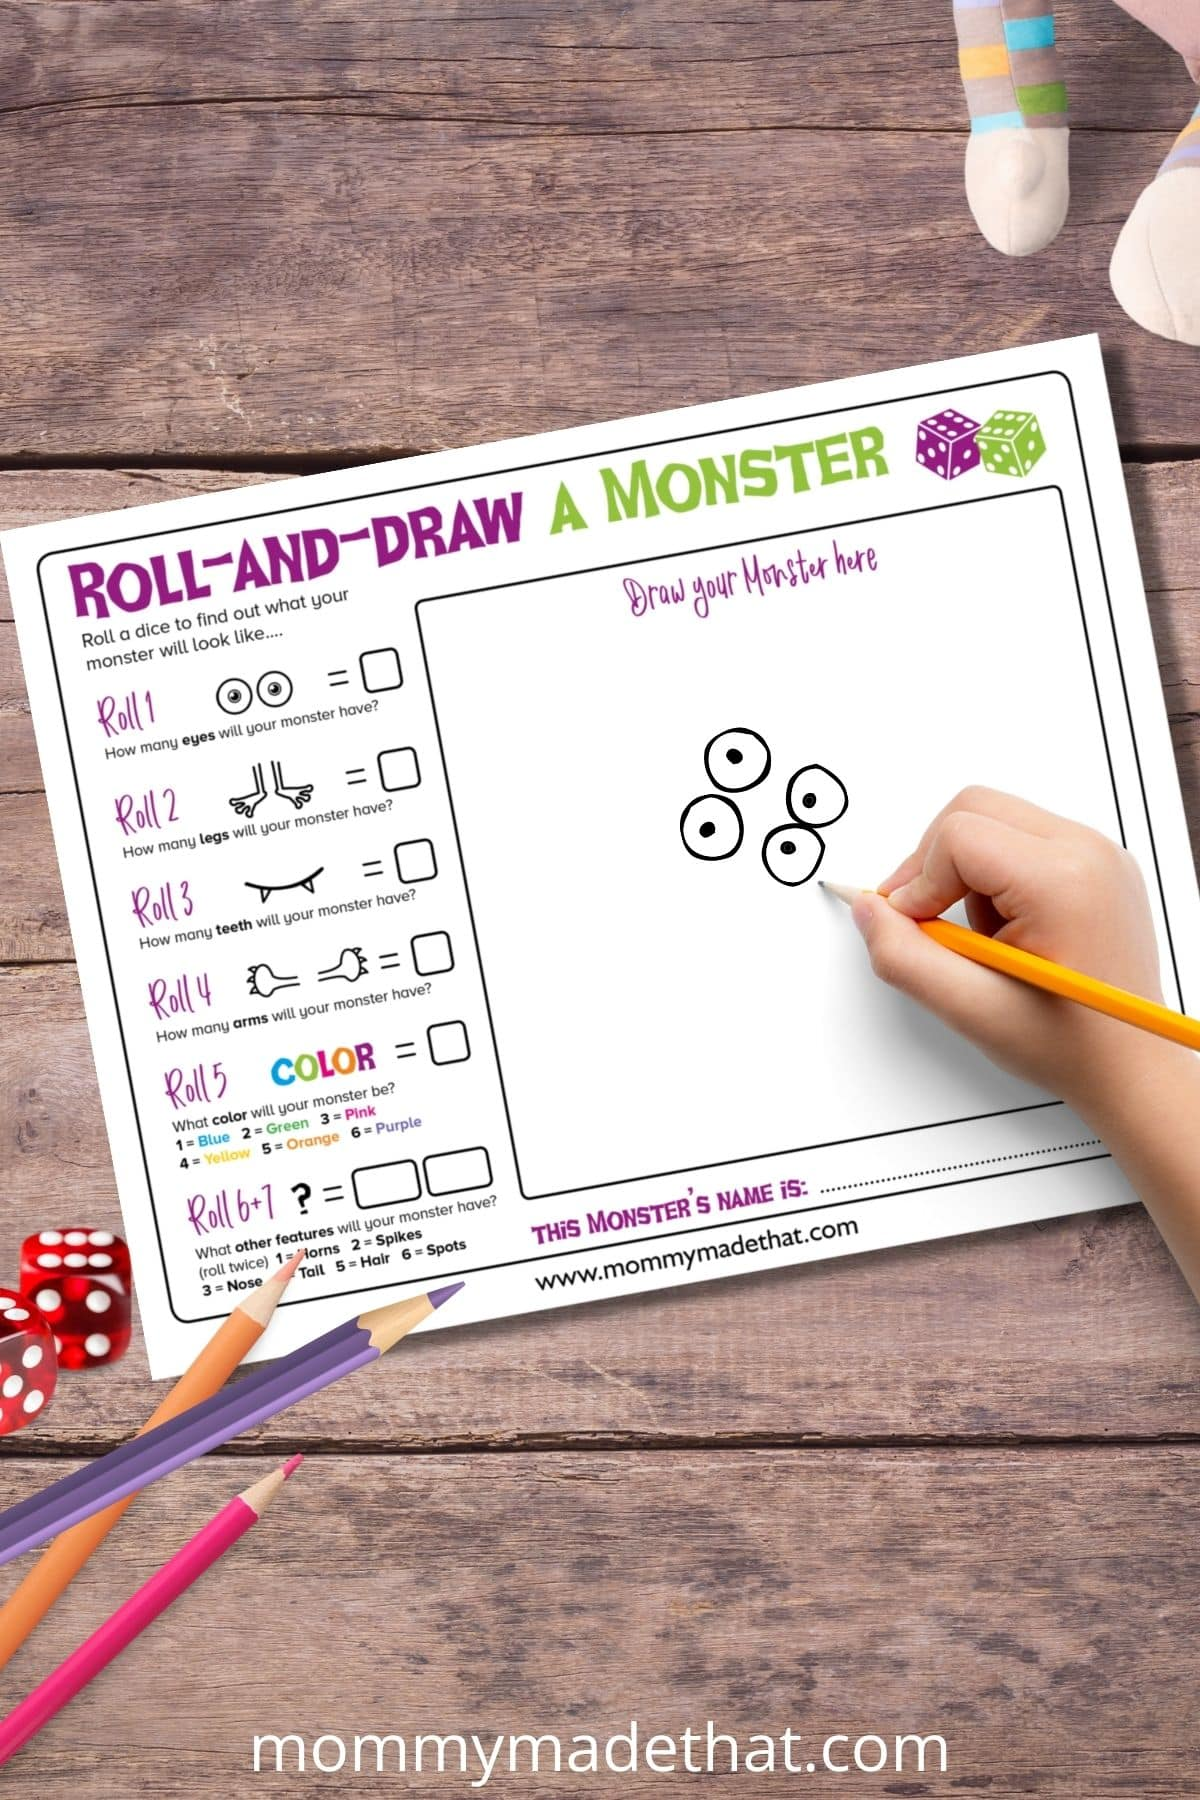 Make your own monster game printable for kids